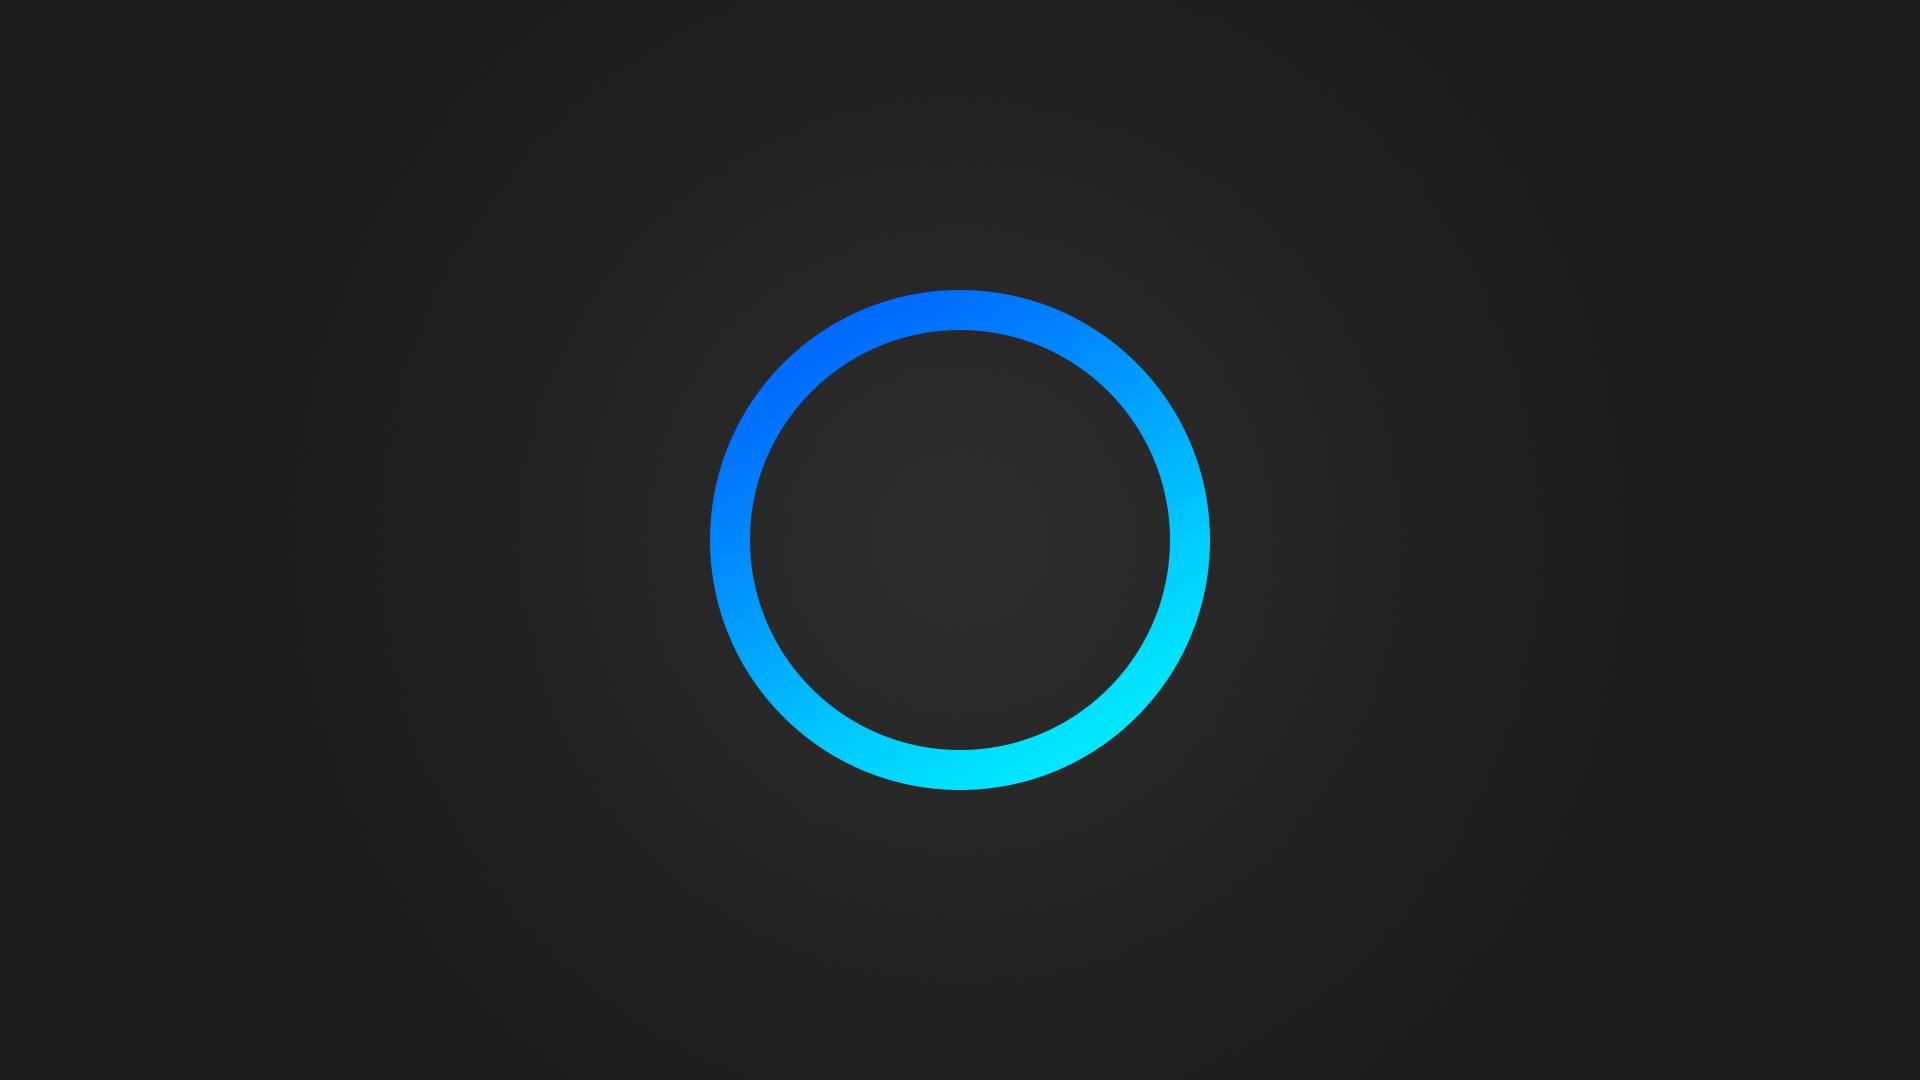 Blue Circle Cortana Simple Gray Background